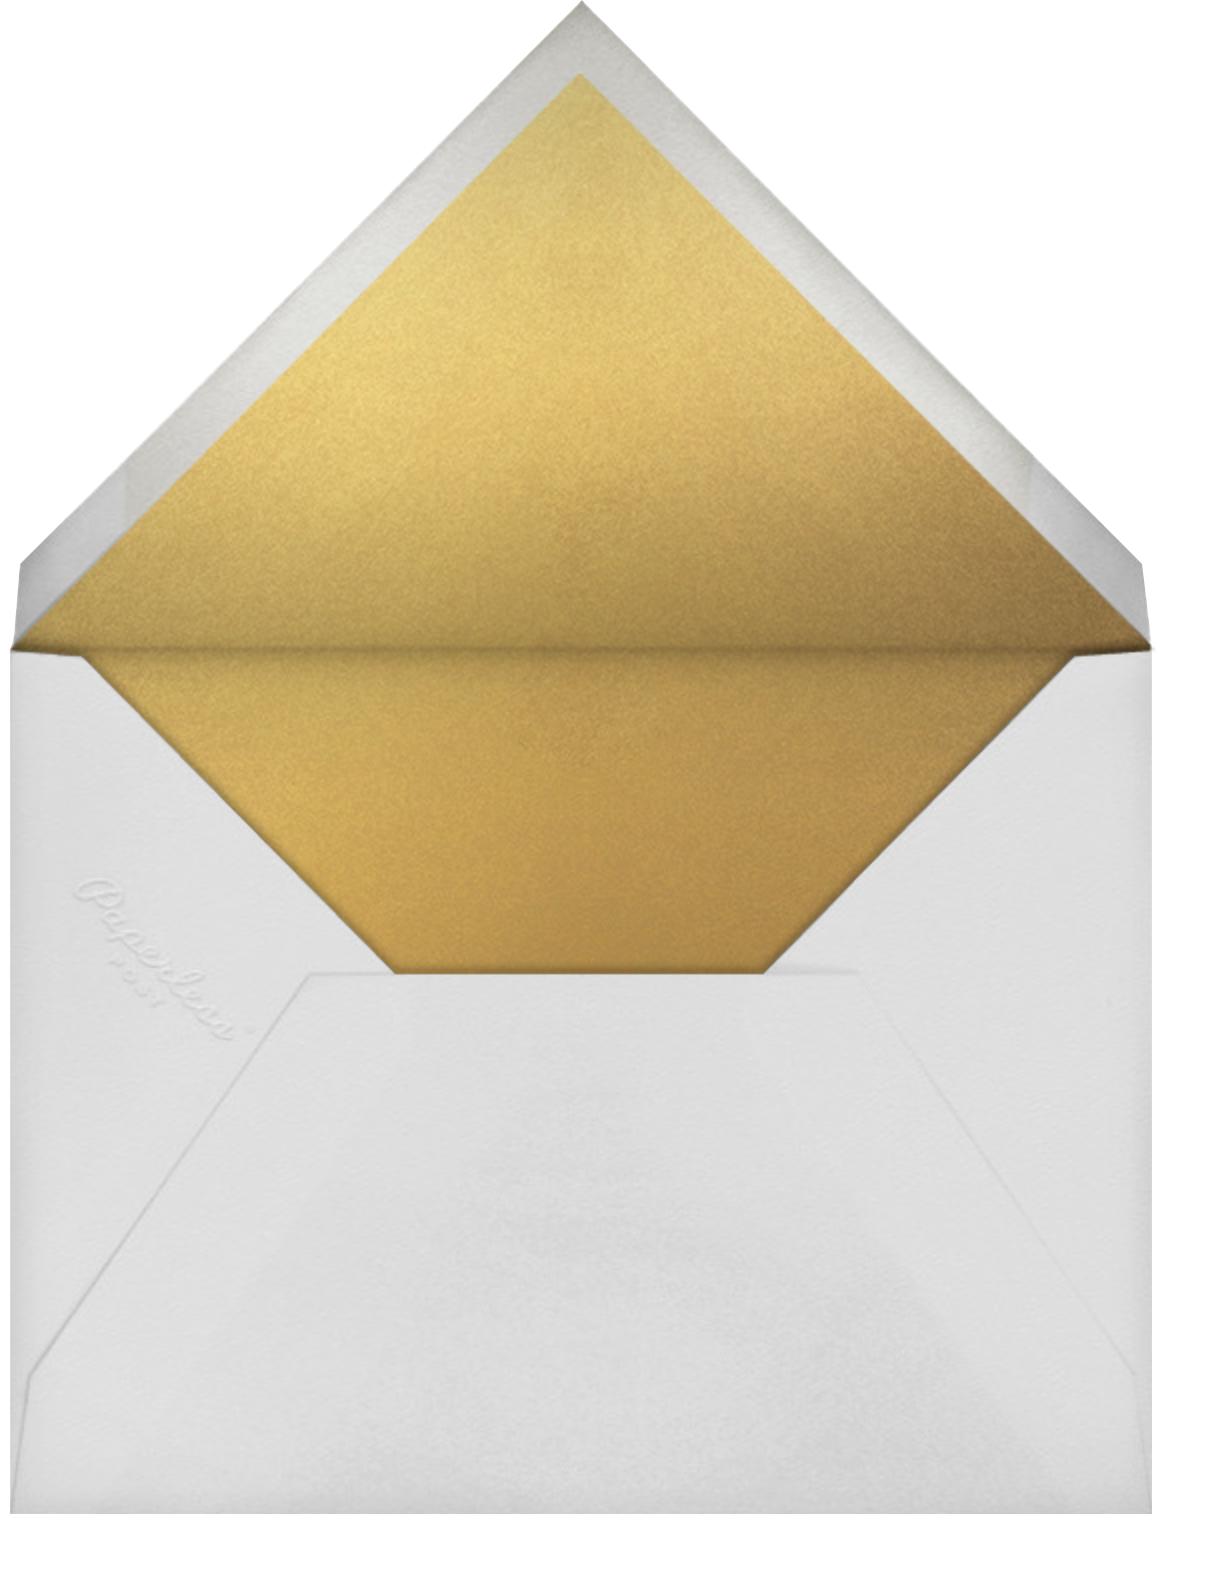 Reinhardt - Paperless Post - Save the date - envelope back